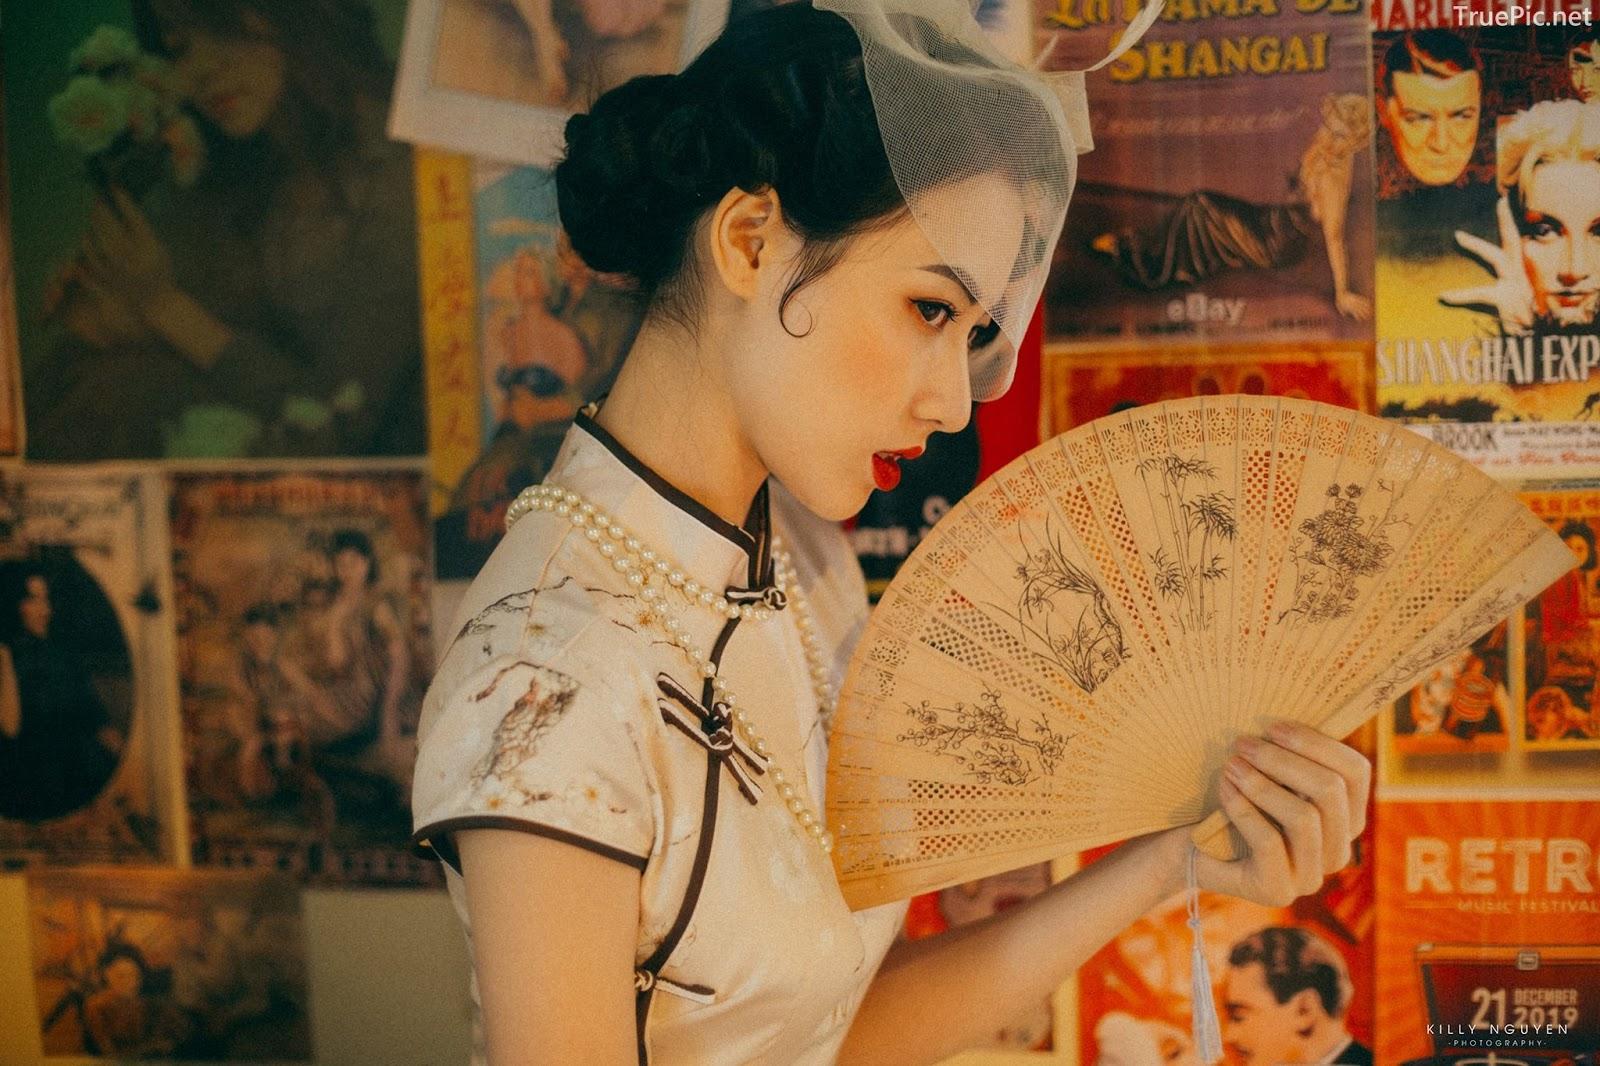 Vietnamese model Lan Huong - Lost in ShangHai - Photo by Killy Nguyen - TruePic.net - Picture 9